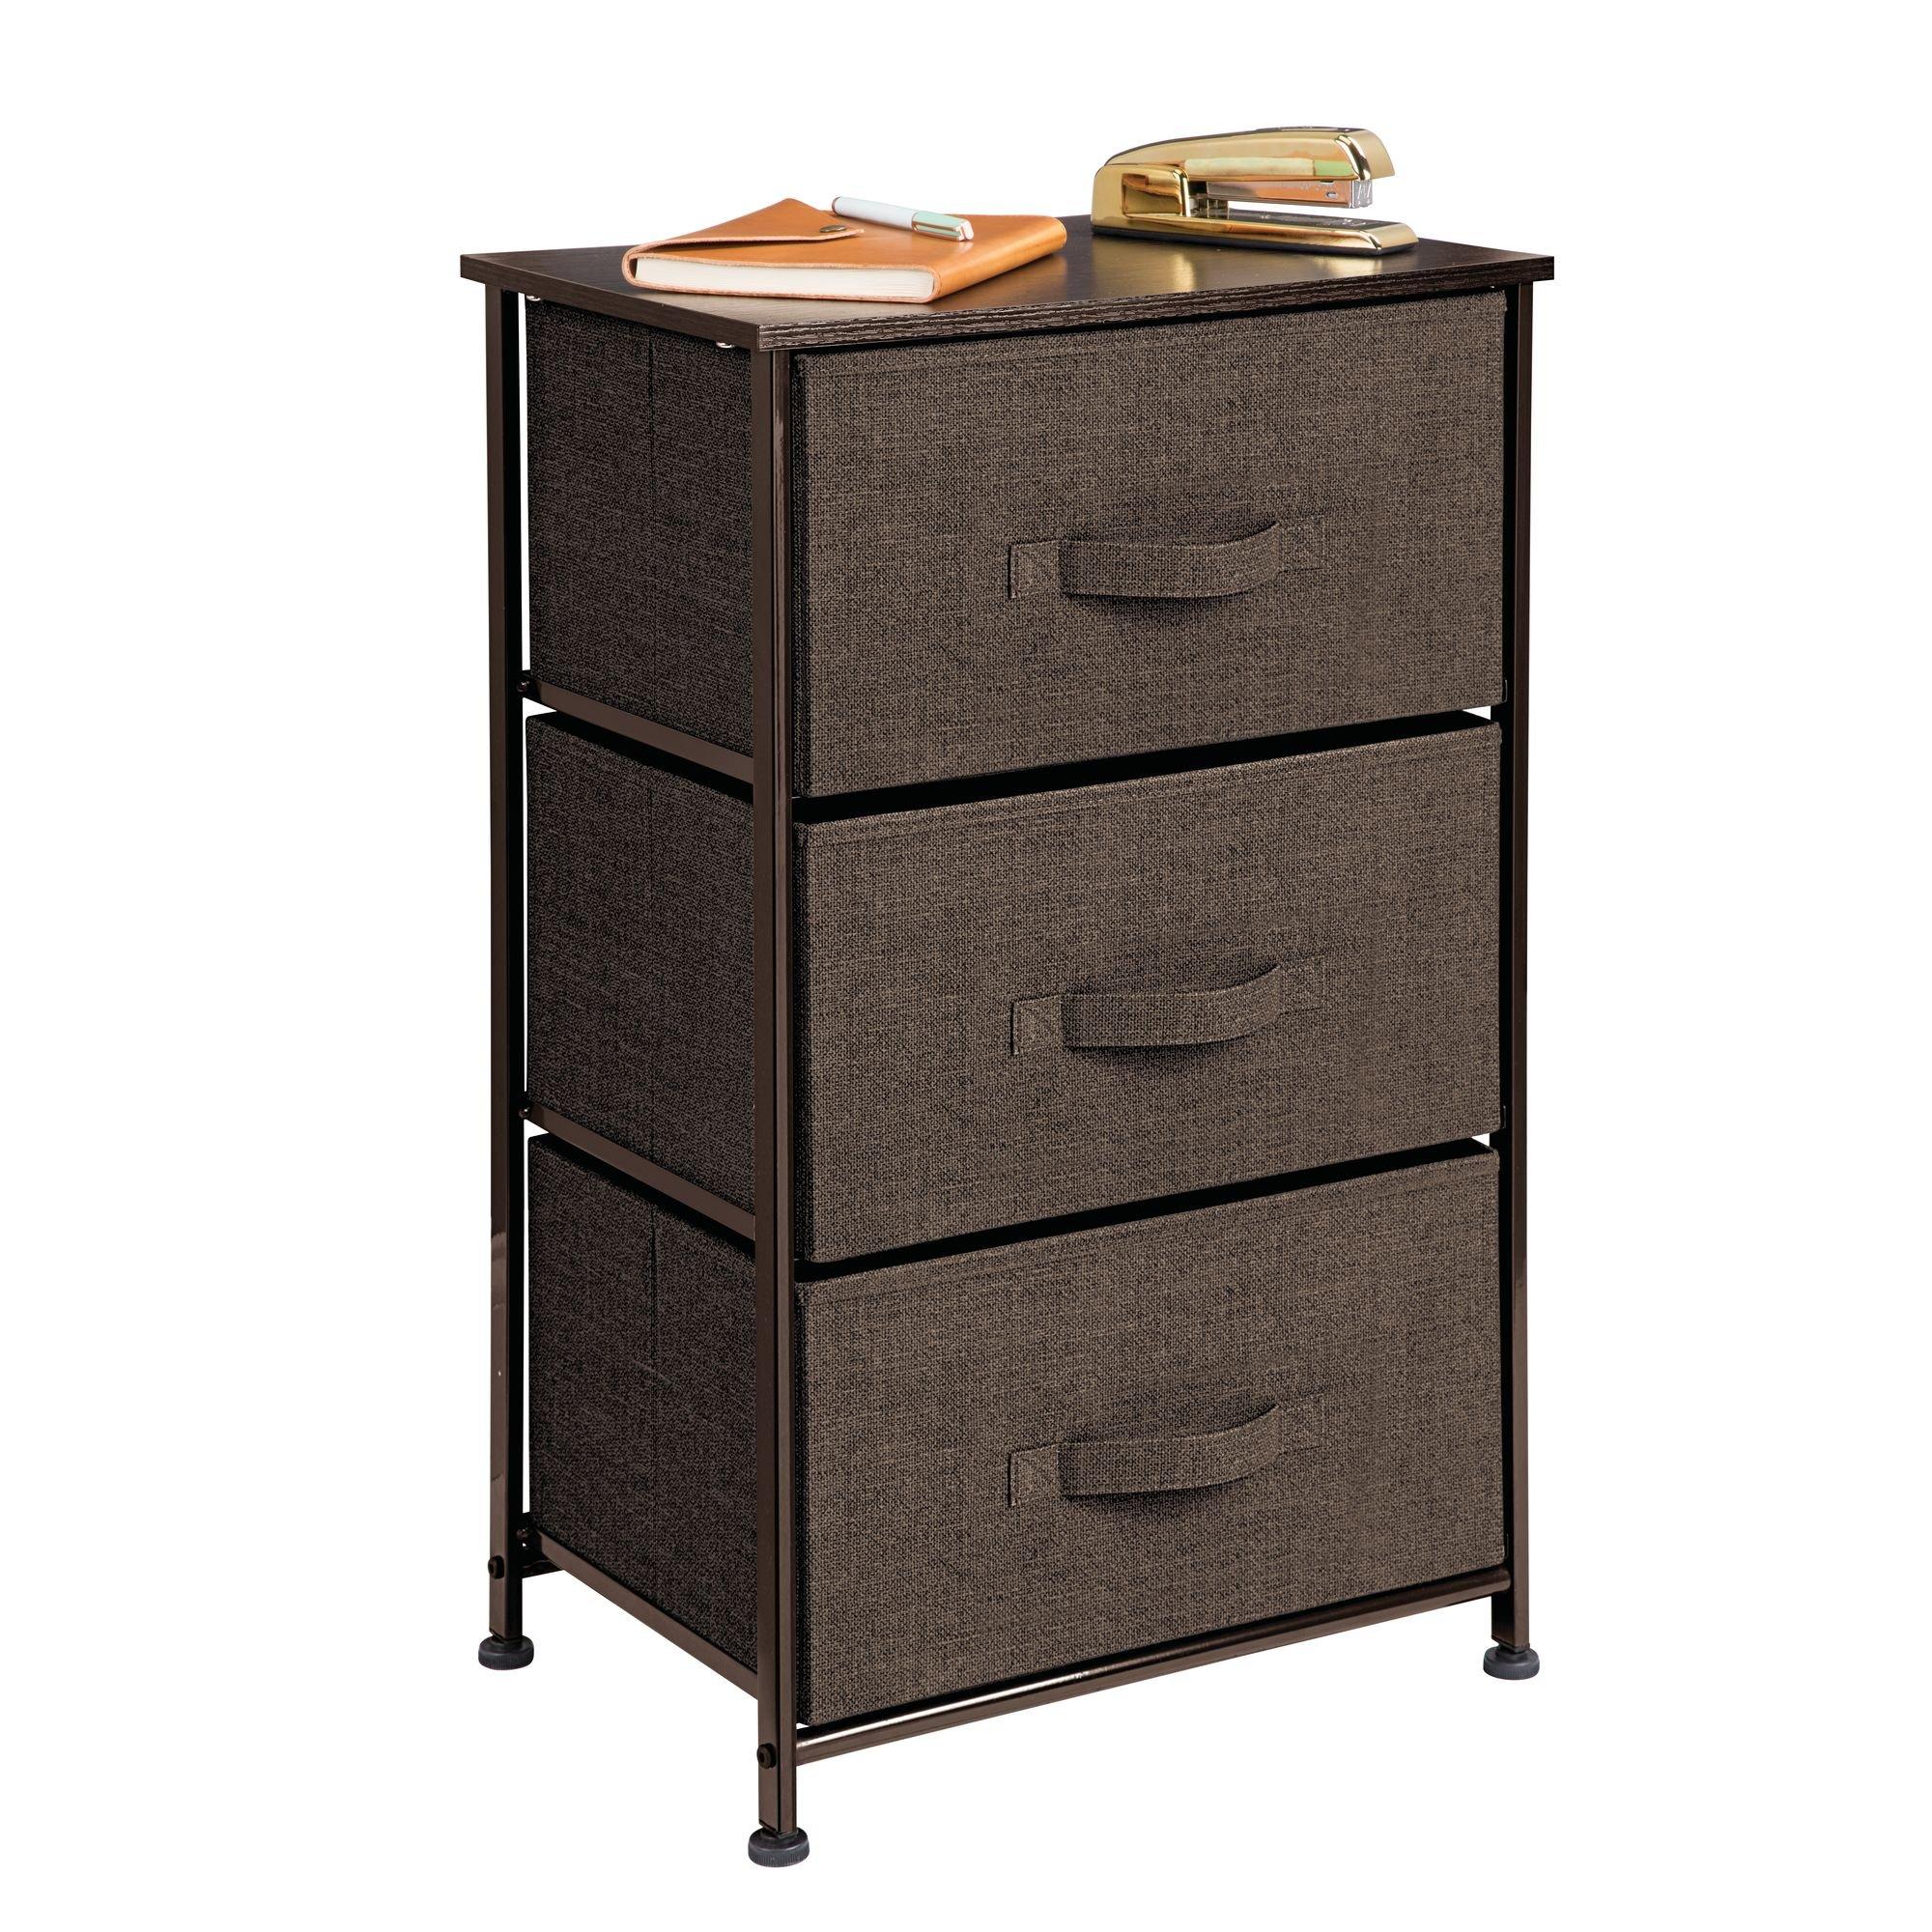 mDesign Vertical Dresser Storage Tower - Sturdy Steel Frame, Wood Top, Easy Pull Fabric Bins - Organizer Unit for Bedroom, Hallway, Entryway, Closets - Textured Print - 3 Drawers, Espresso